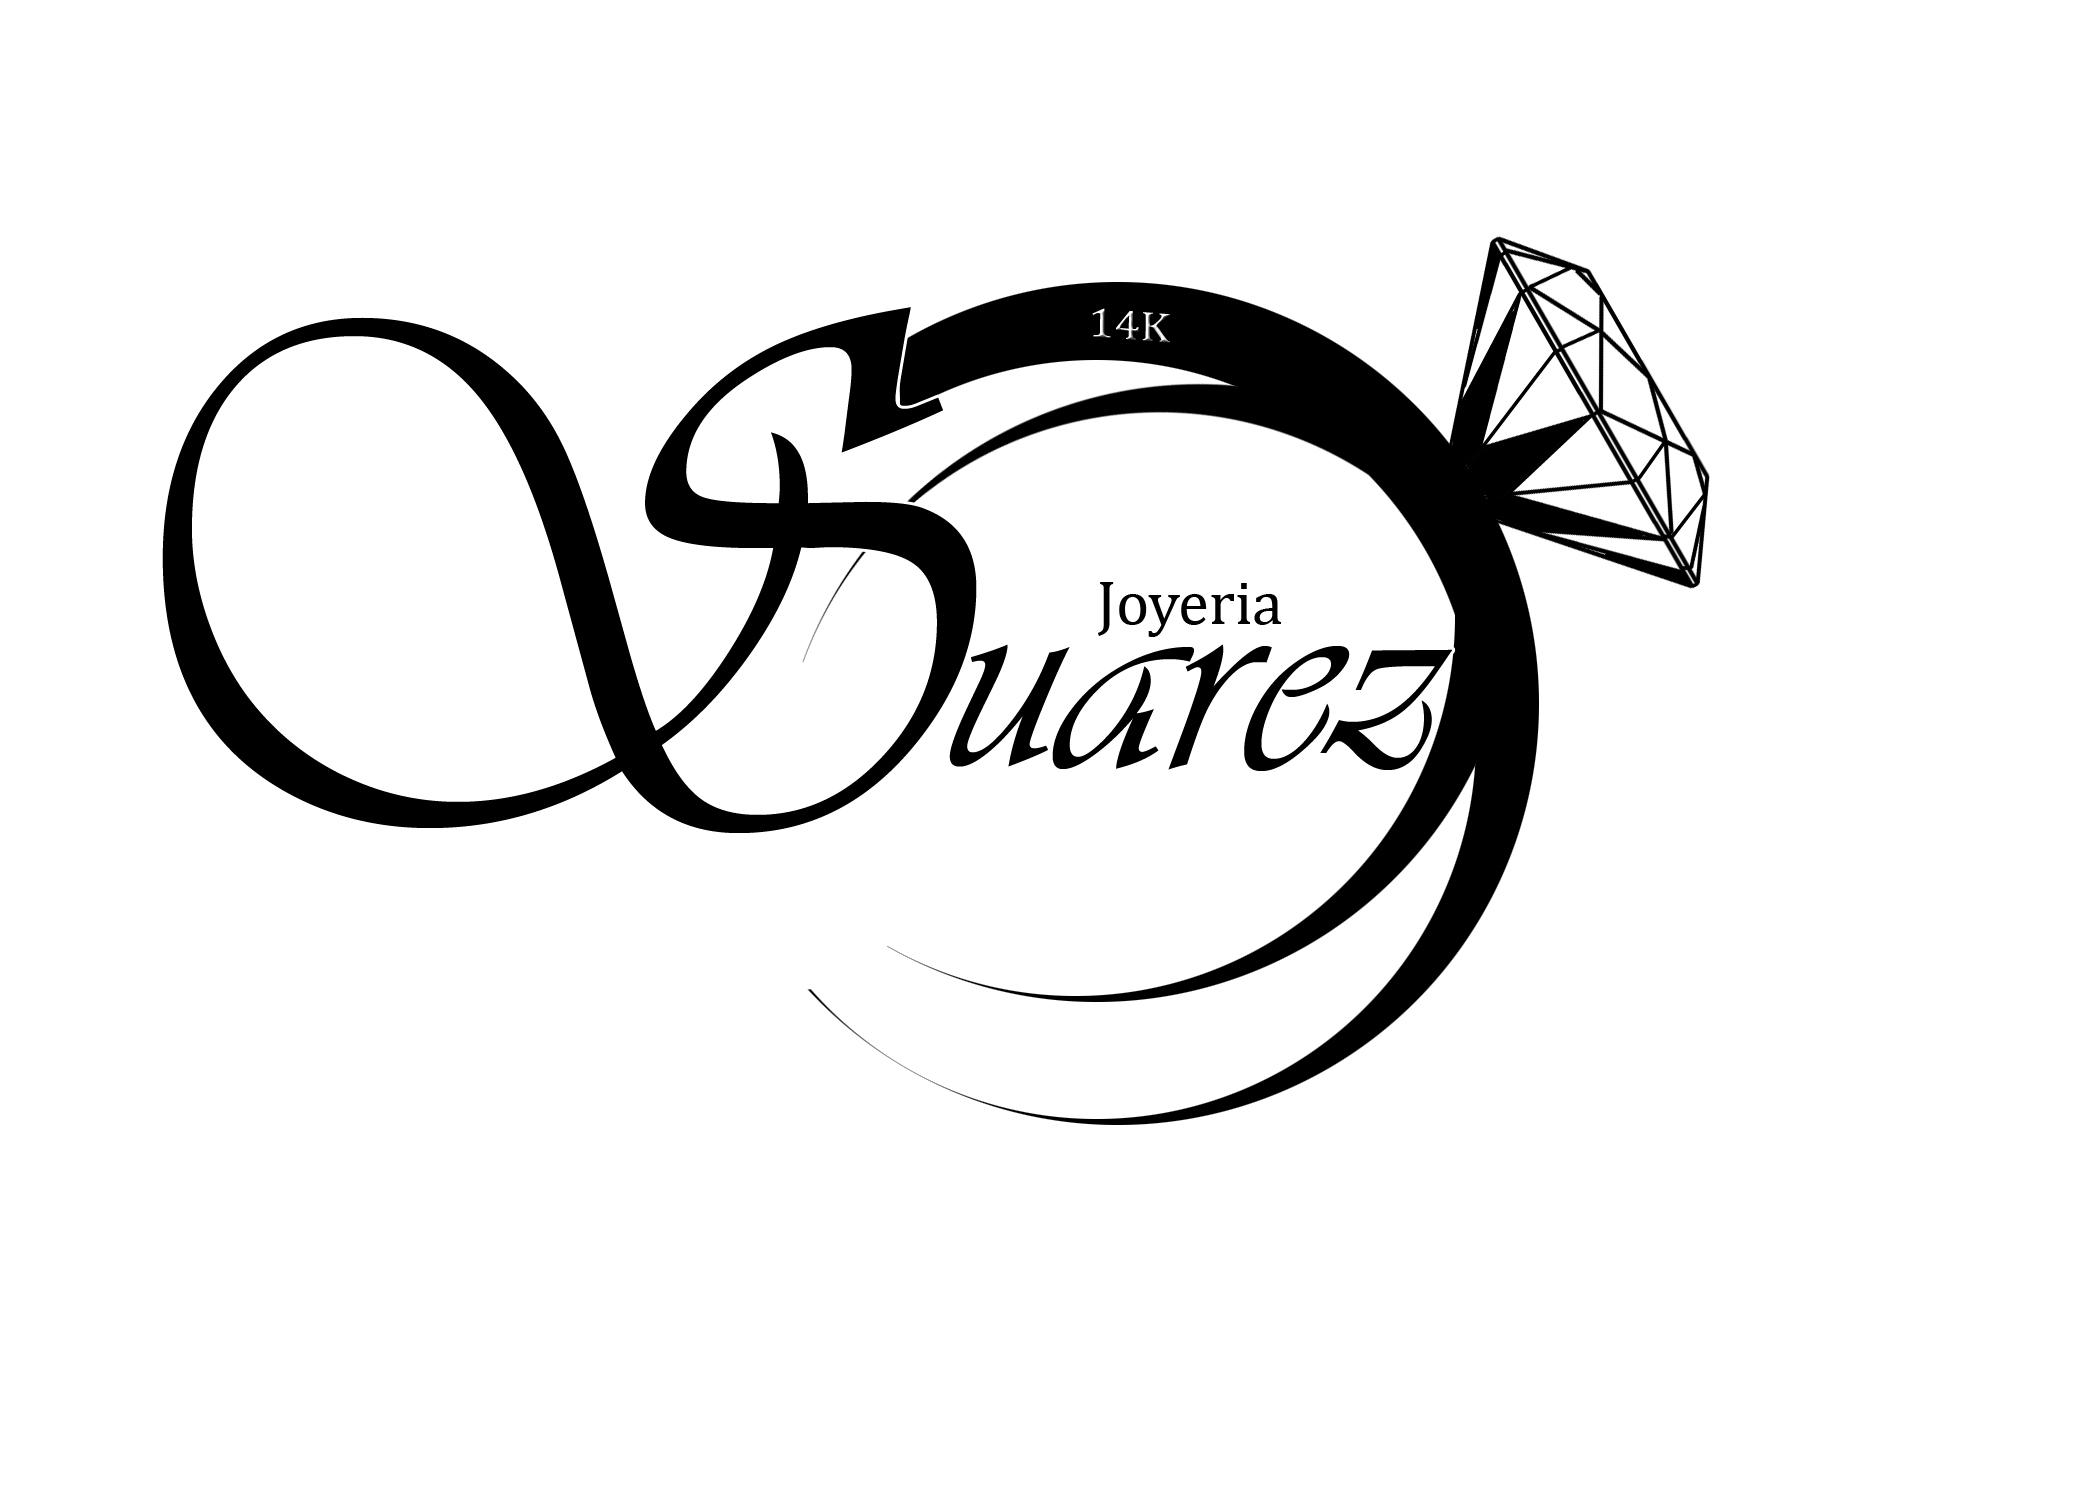 Joyeria Suarez Logo Wallpaper